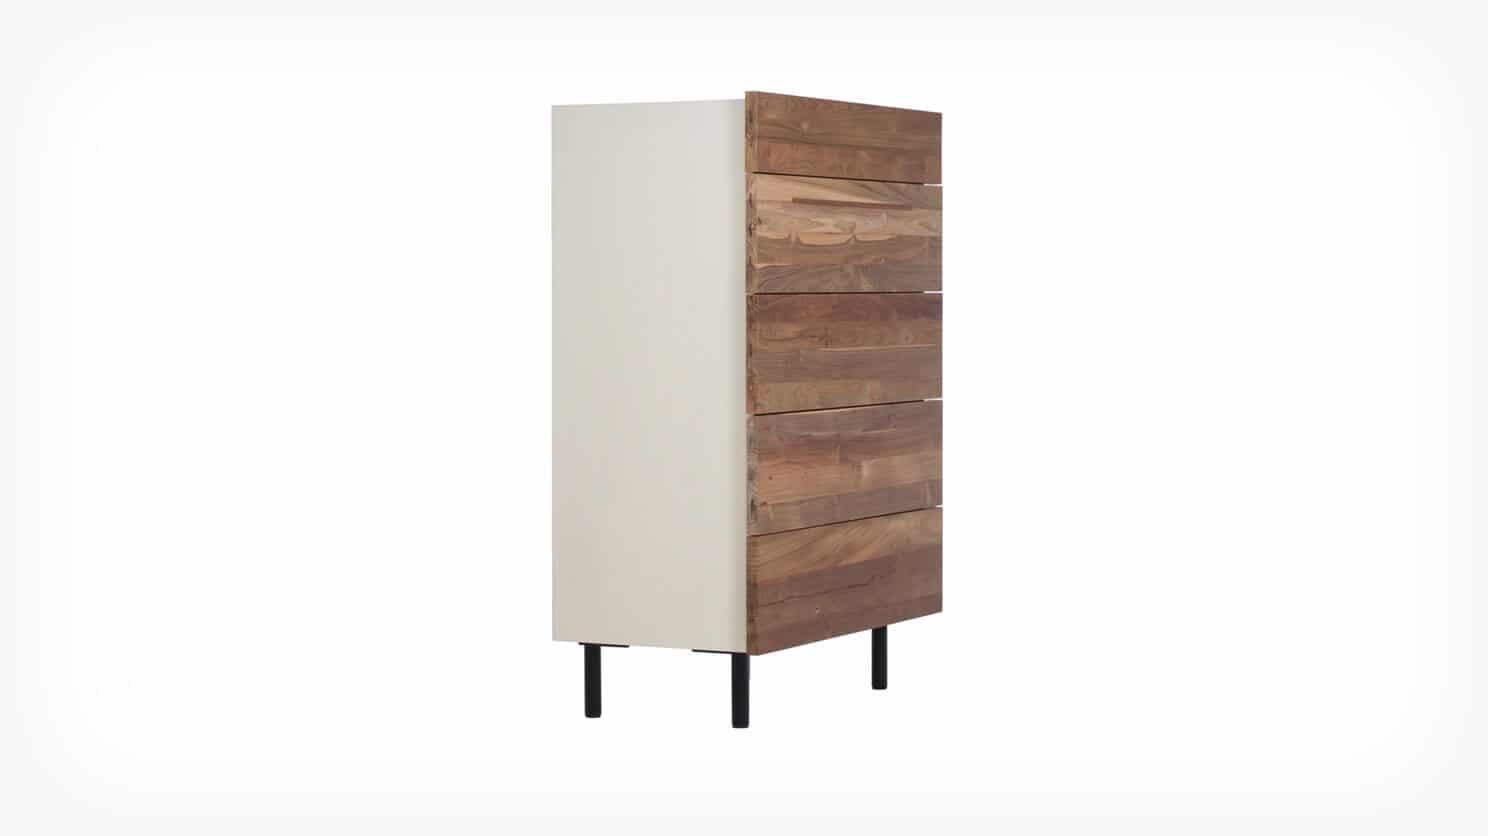 7040 437 par 1 chests reclaimed chest teak corner